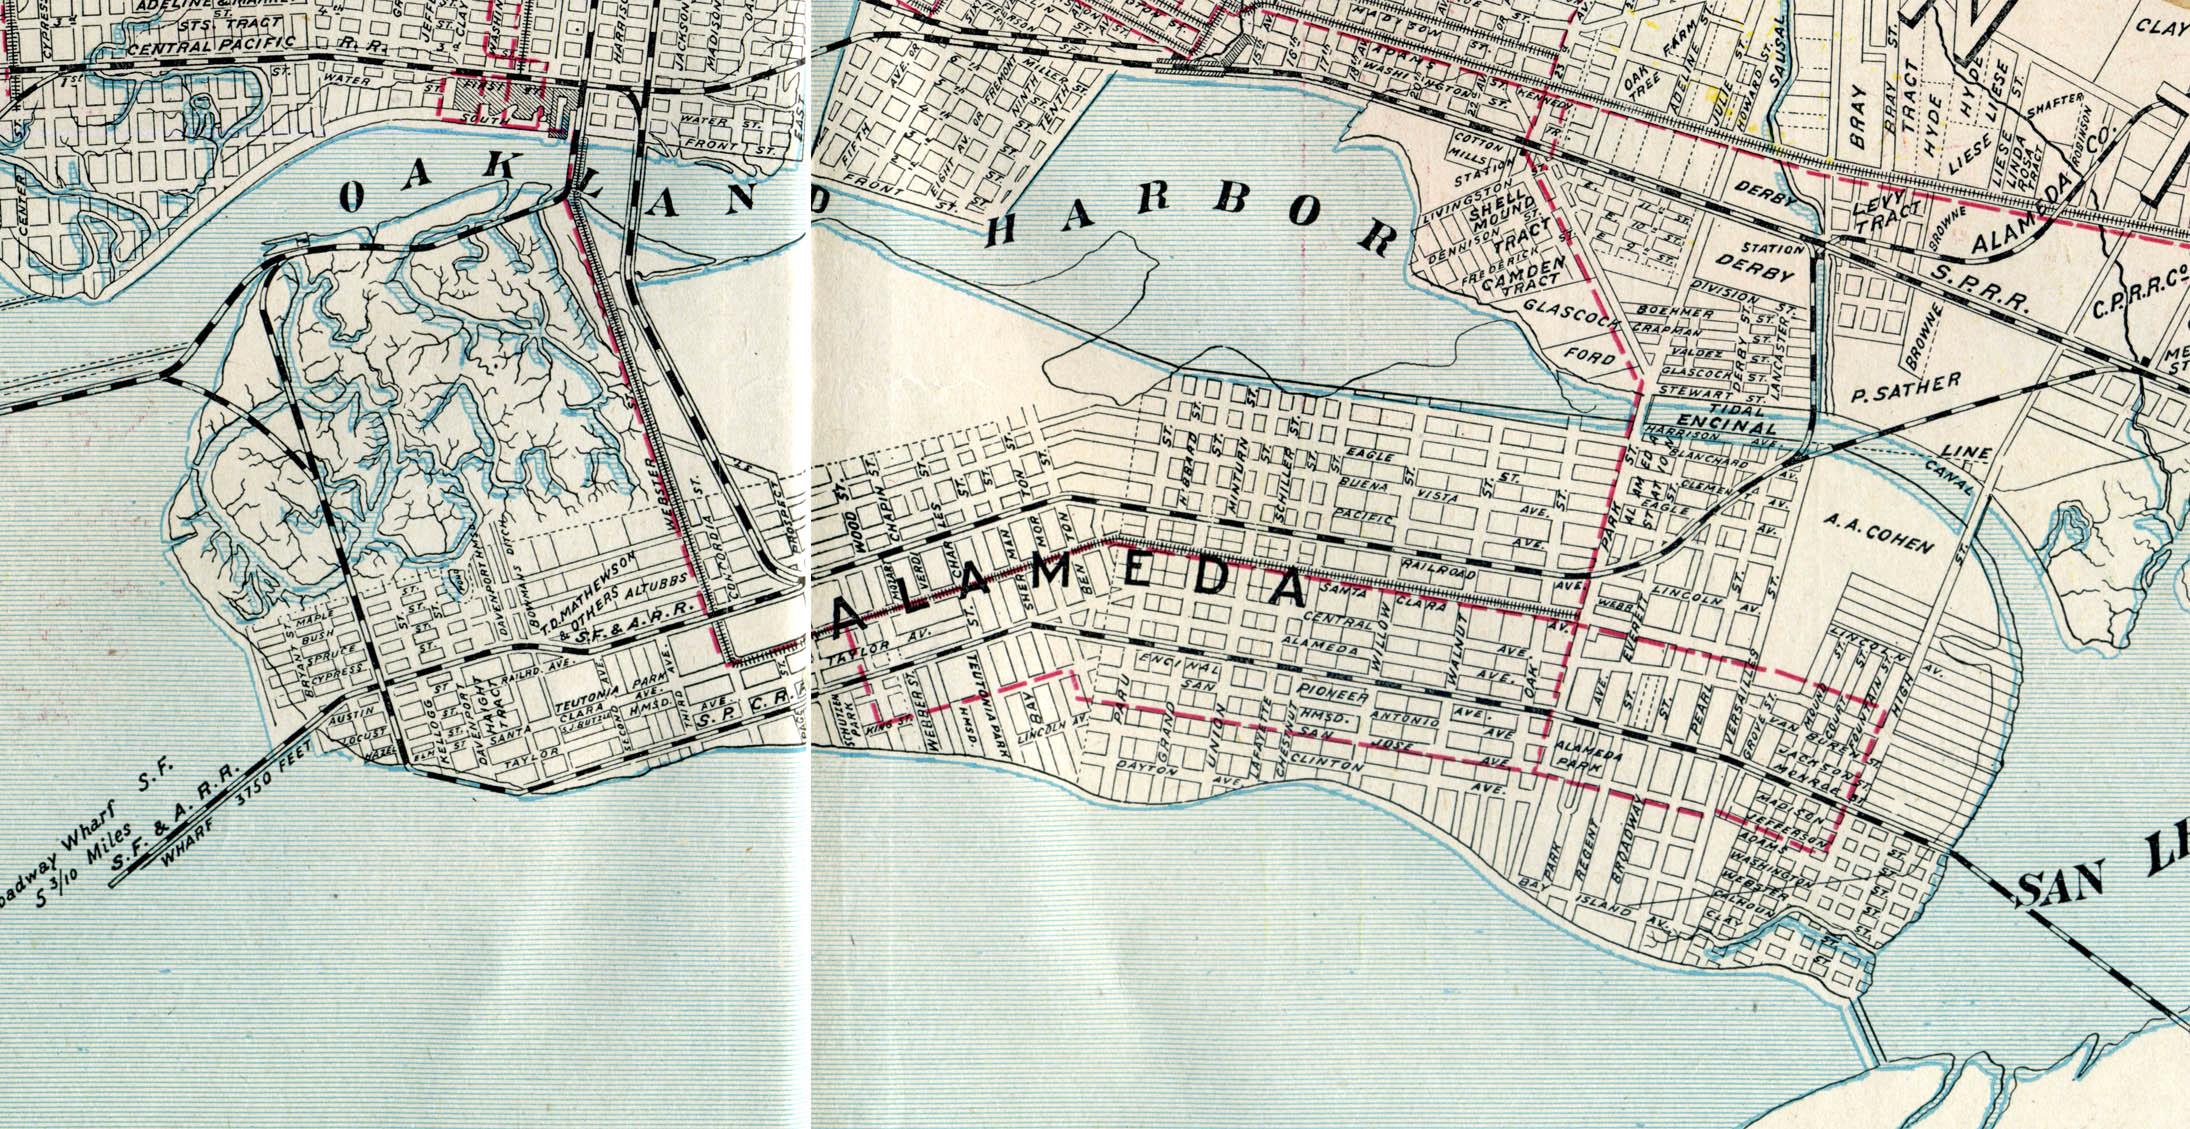 Map-of-the-City-of-Oakland-Berkeley-and-Alameda-George-Cram-1908-03-1.jpg